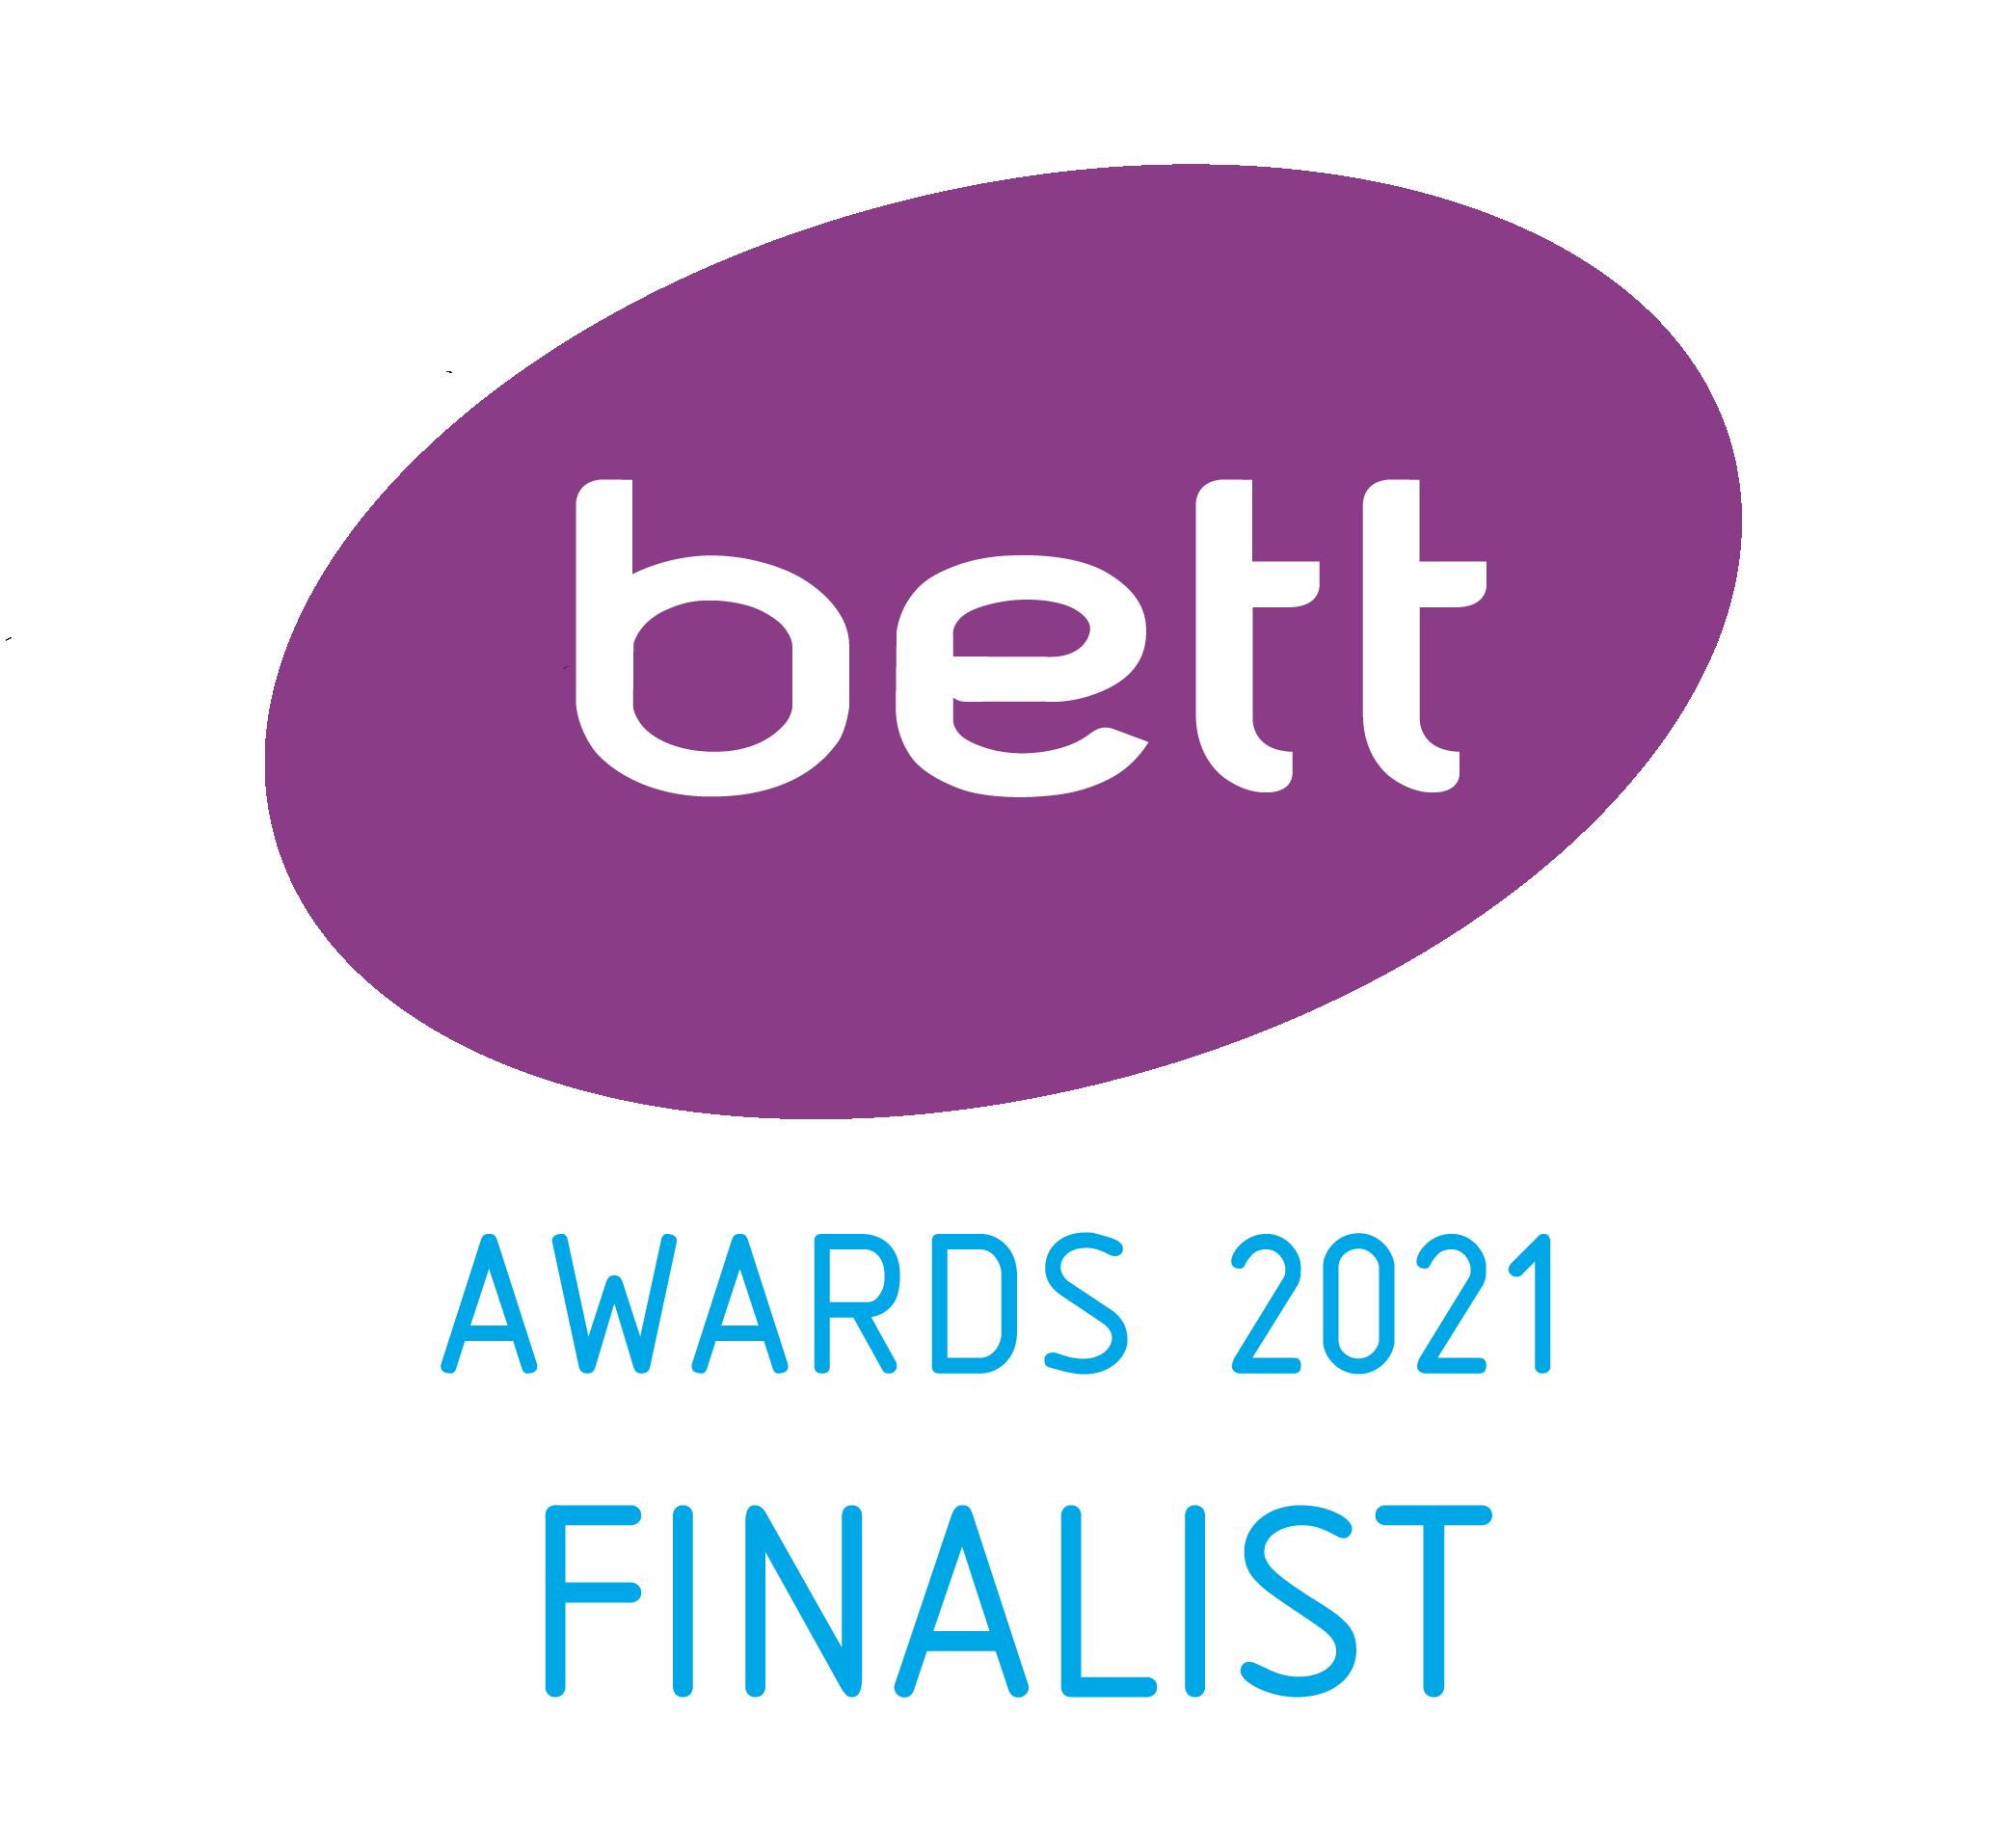 BETT Awards 2021 finalist